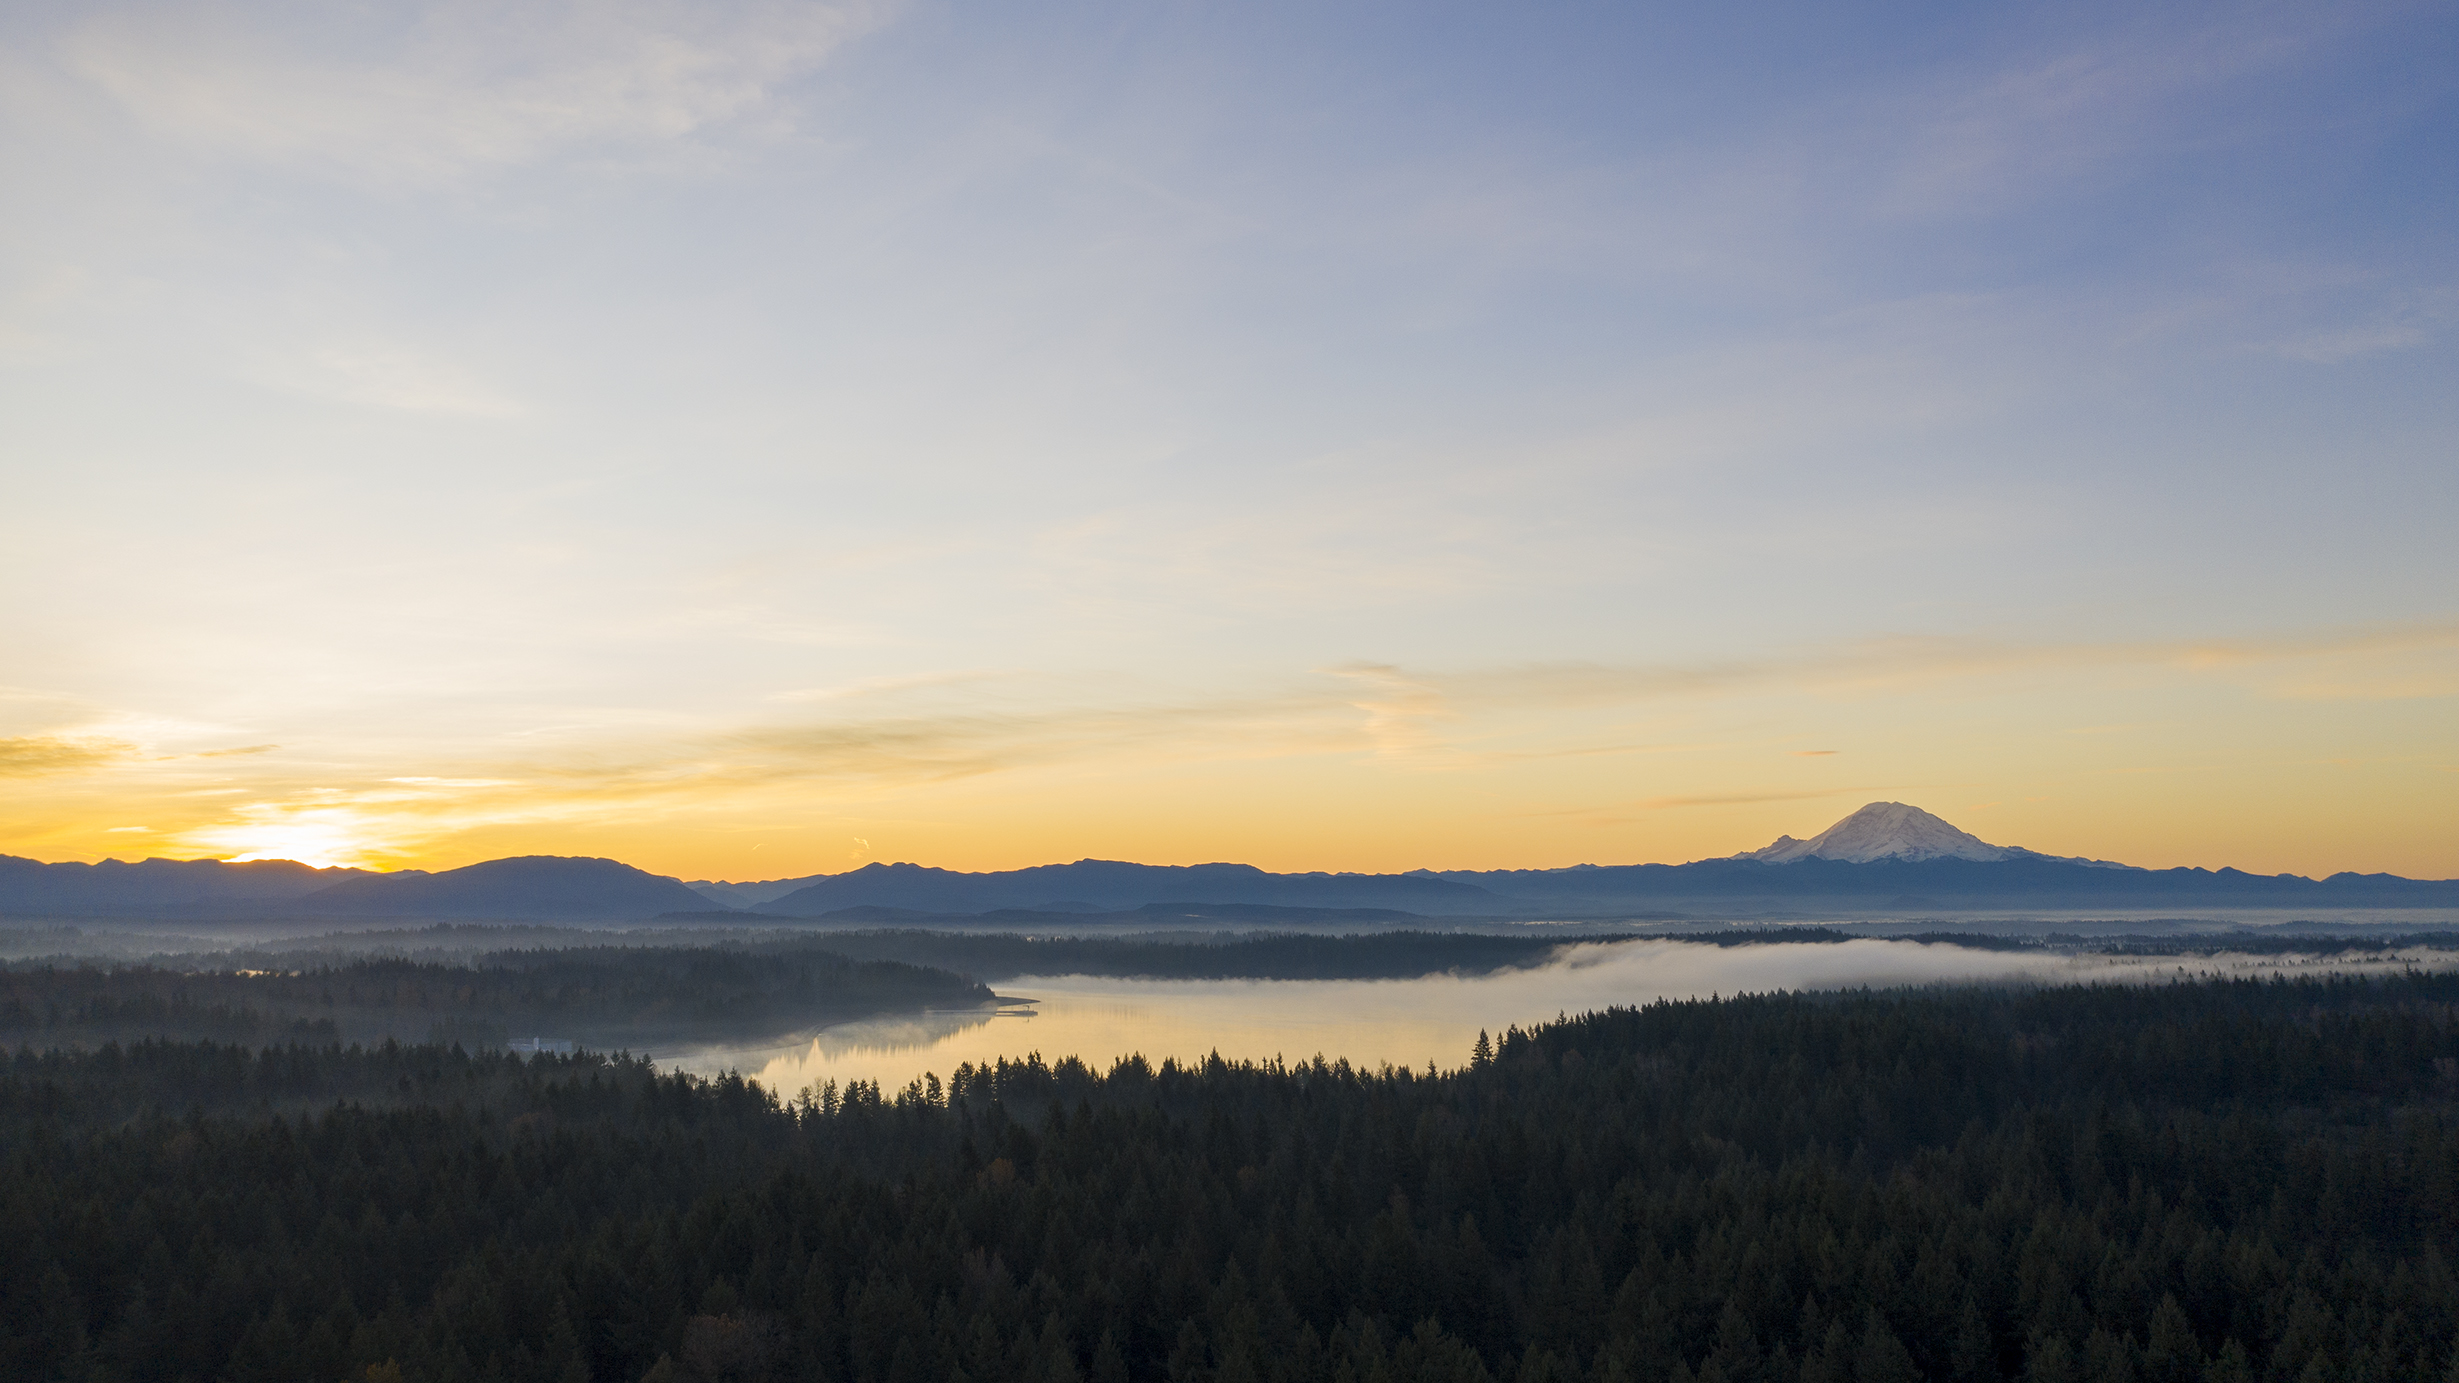 11_02_2019_Lake_Youngs_Sunrise_Small.jpg